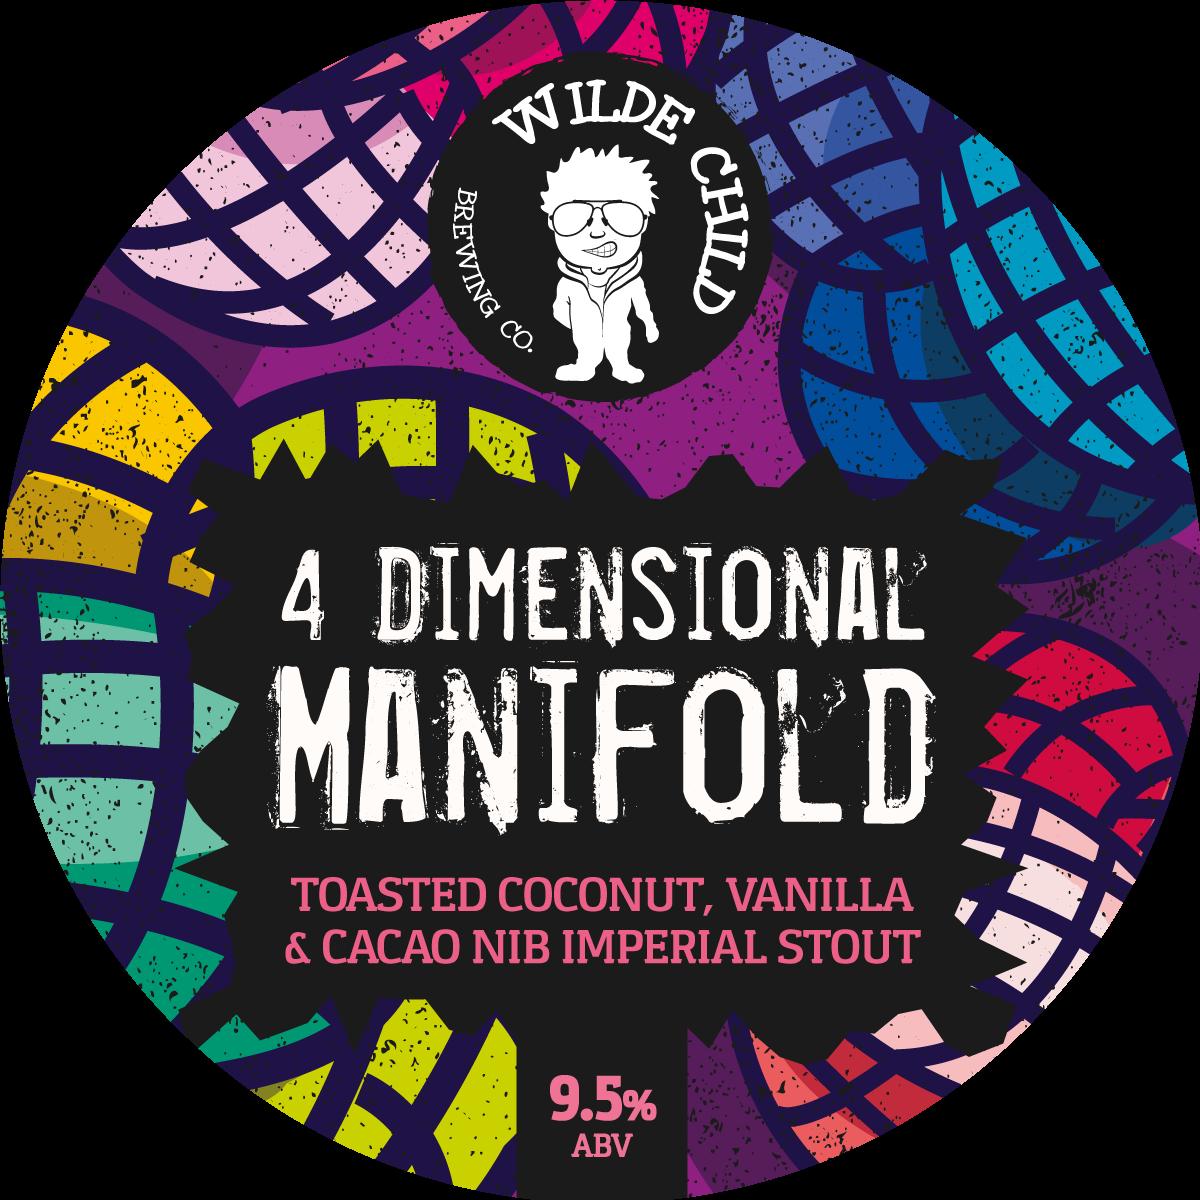 Wilde-Cild-Brewing-Co.--4-Dimensional-Manifold-Round